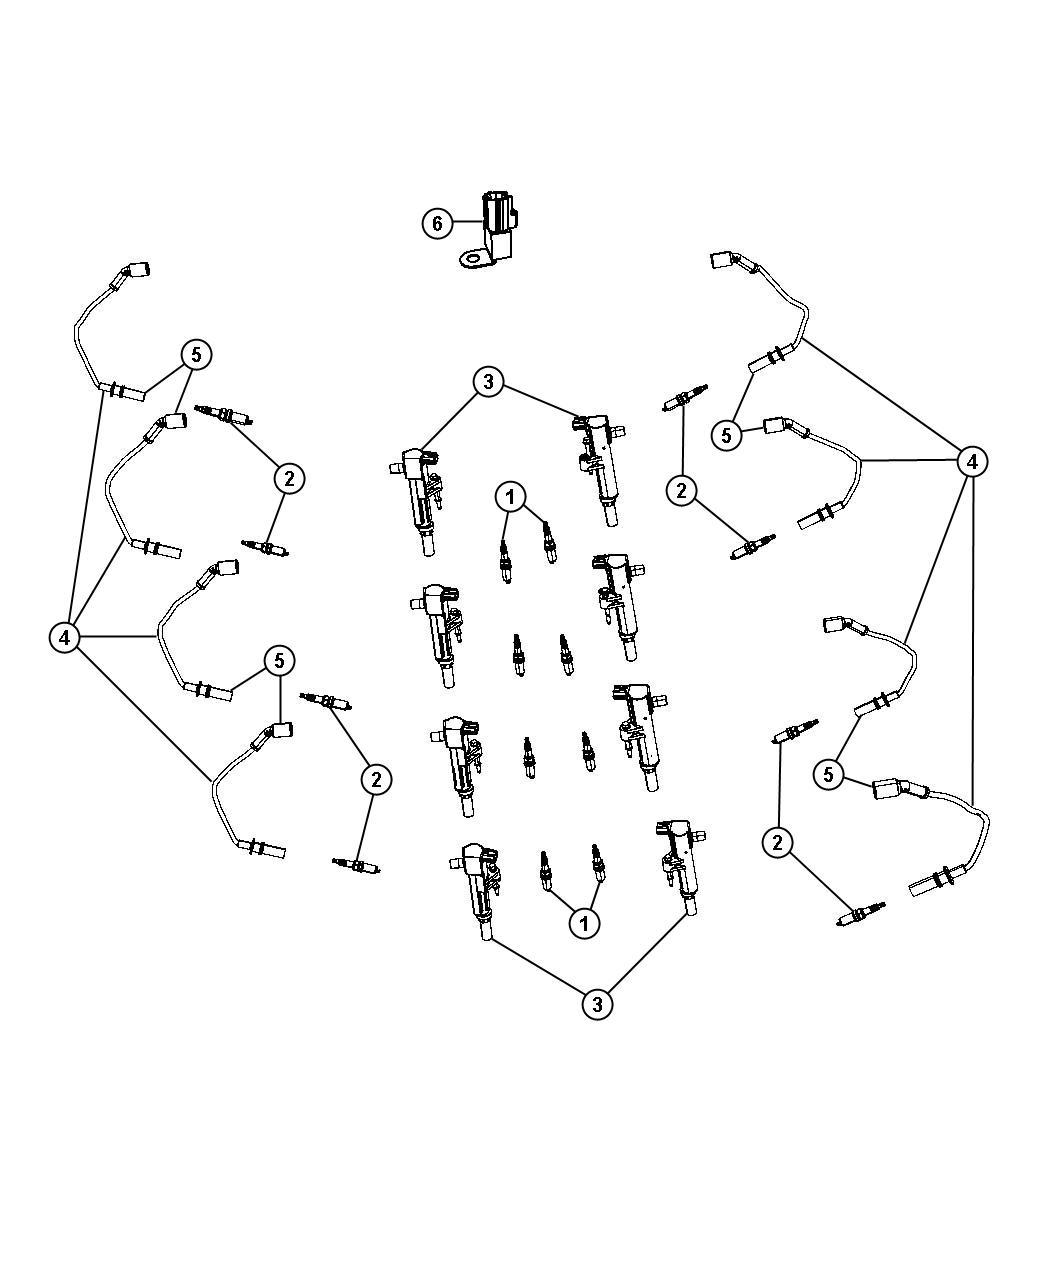 V8 Spark Plug Diagram